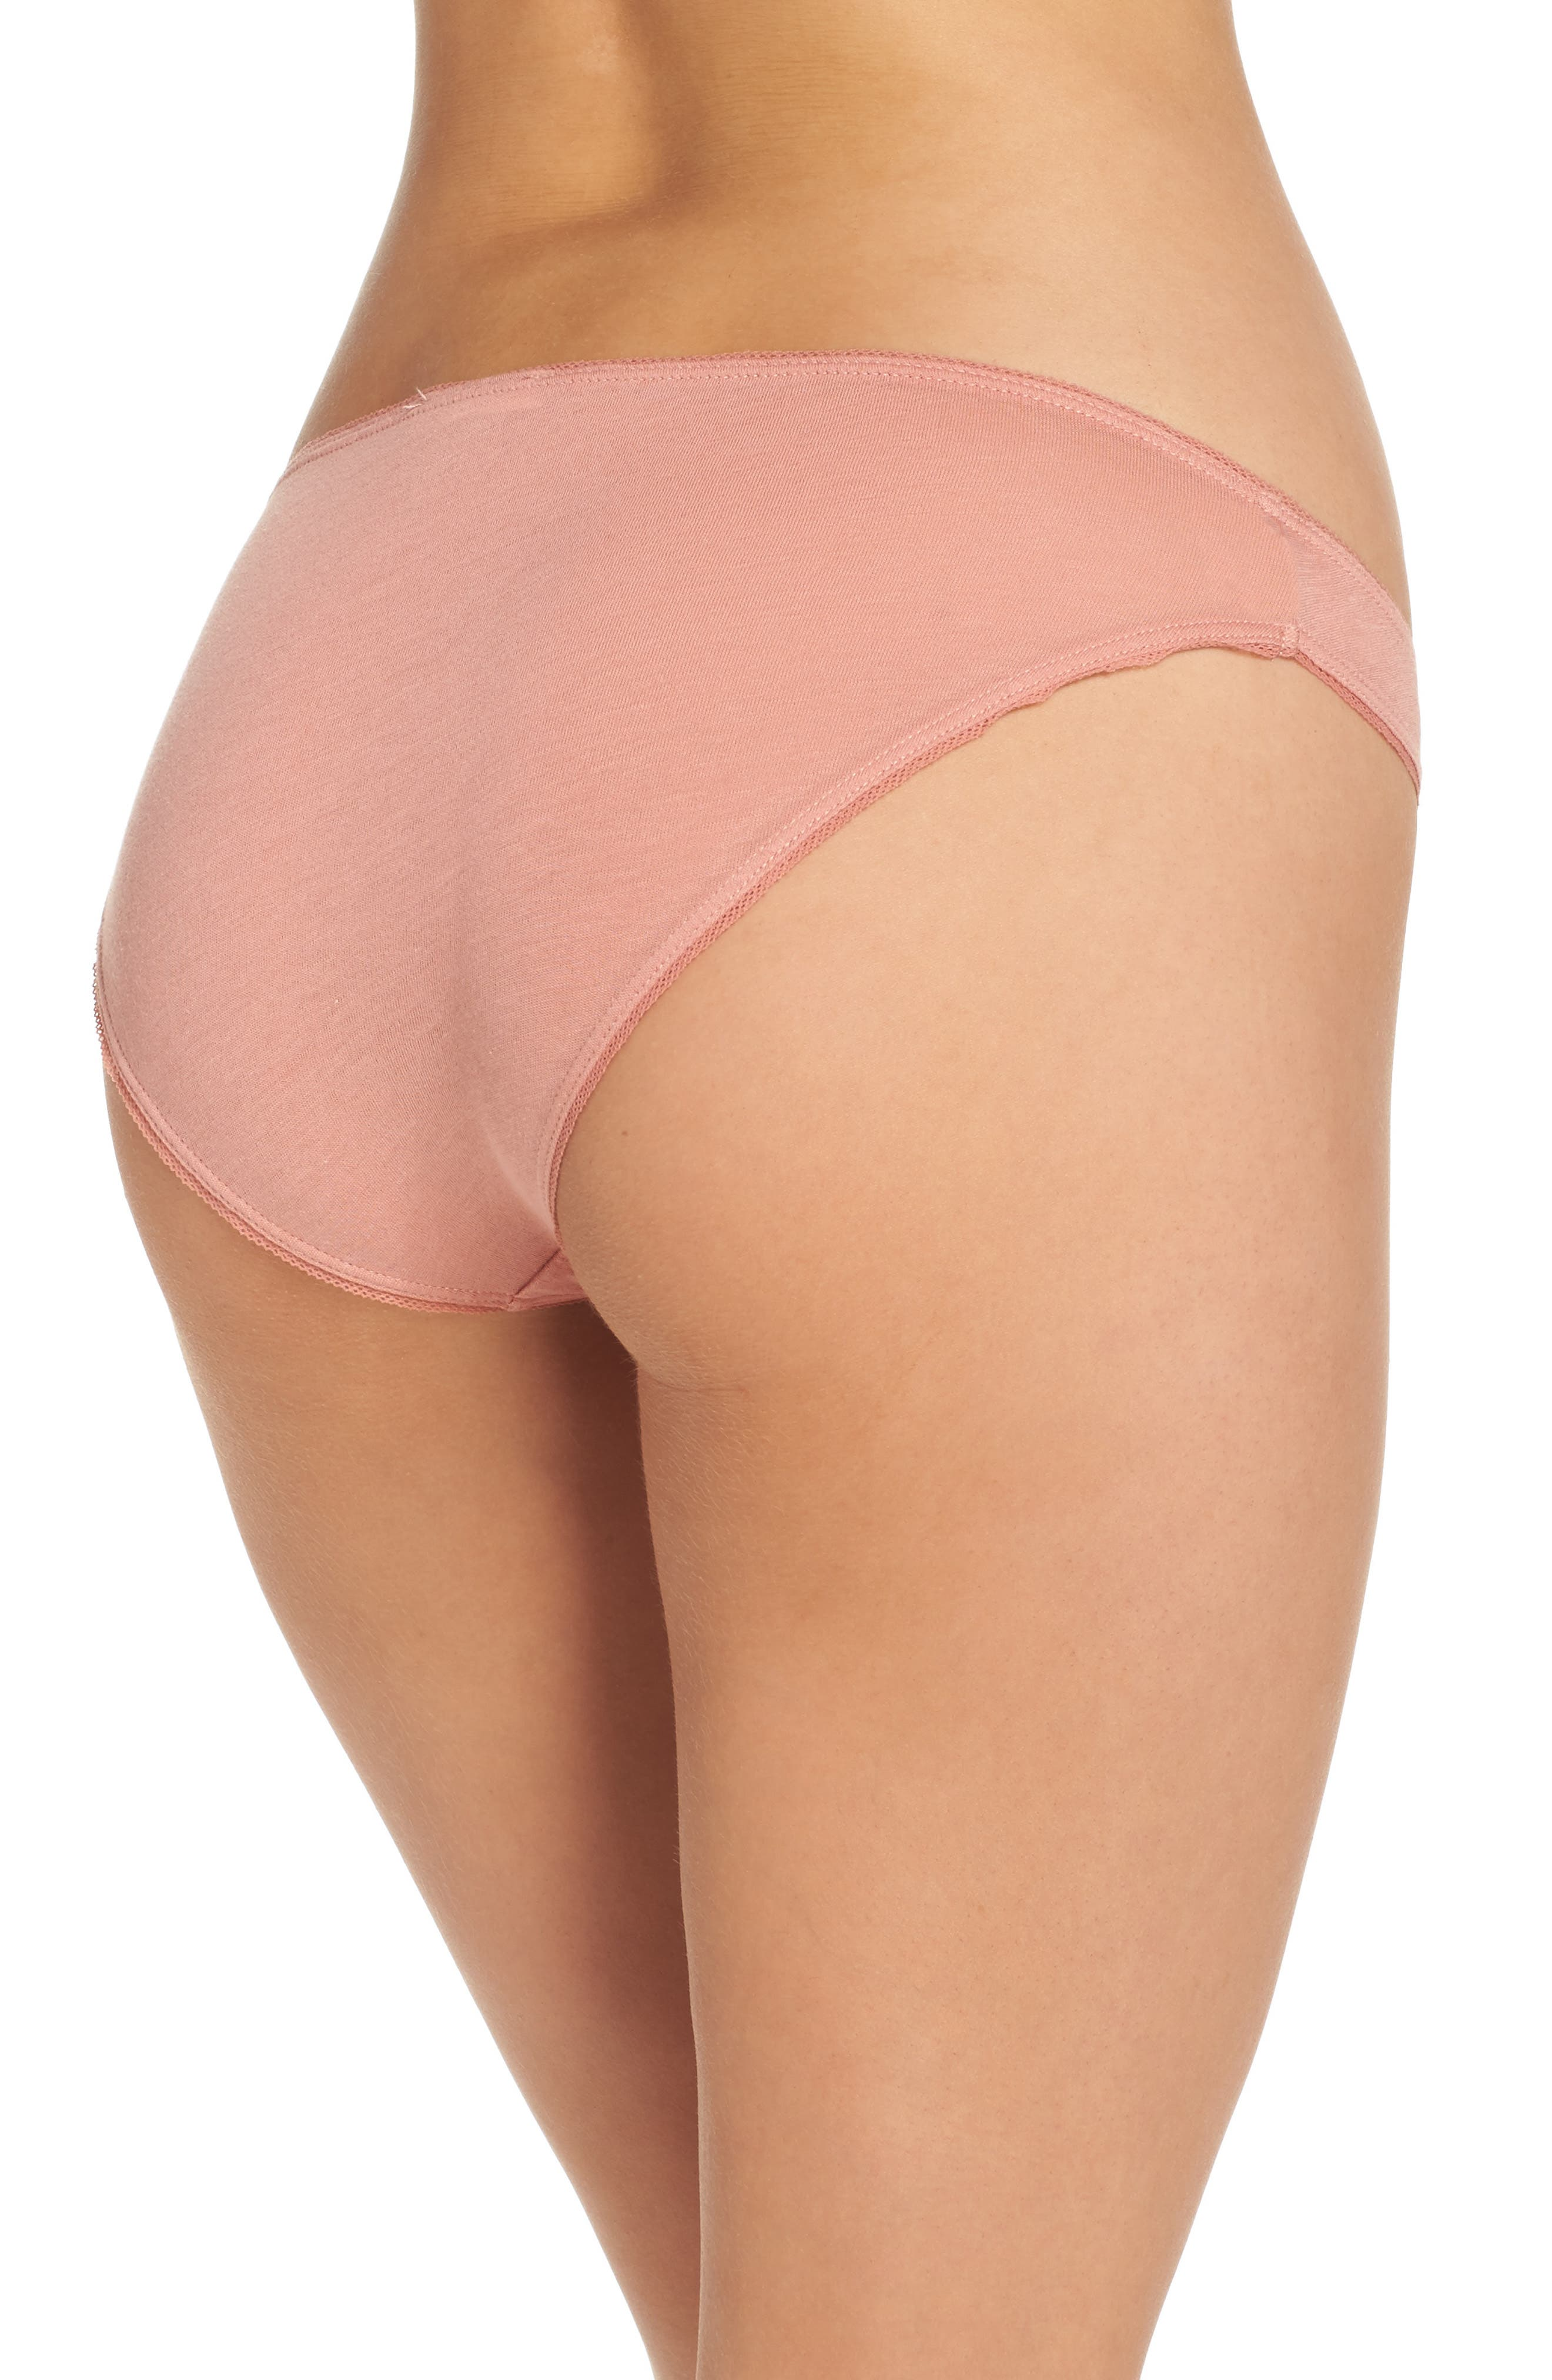 Organic Cotton Bikini,                             Alternate thumbnail 2, color,                             Vintage Pink